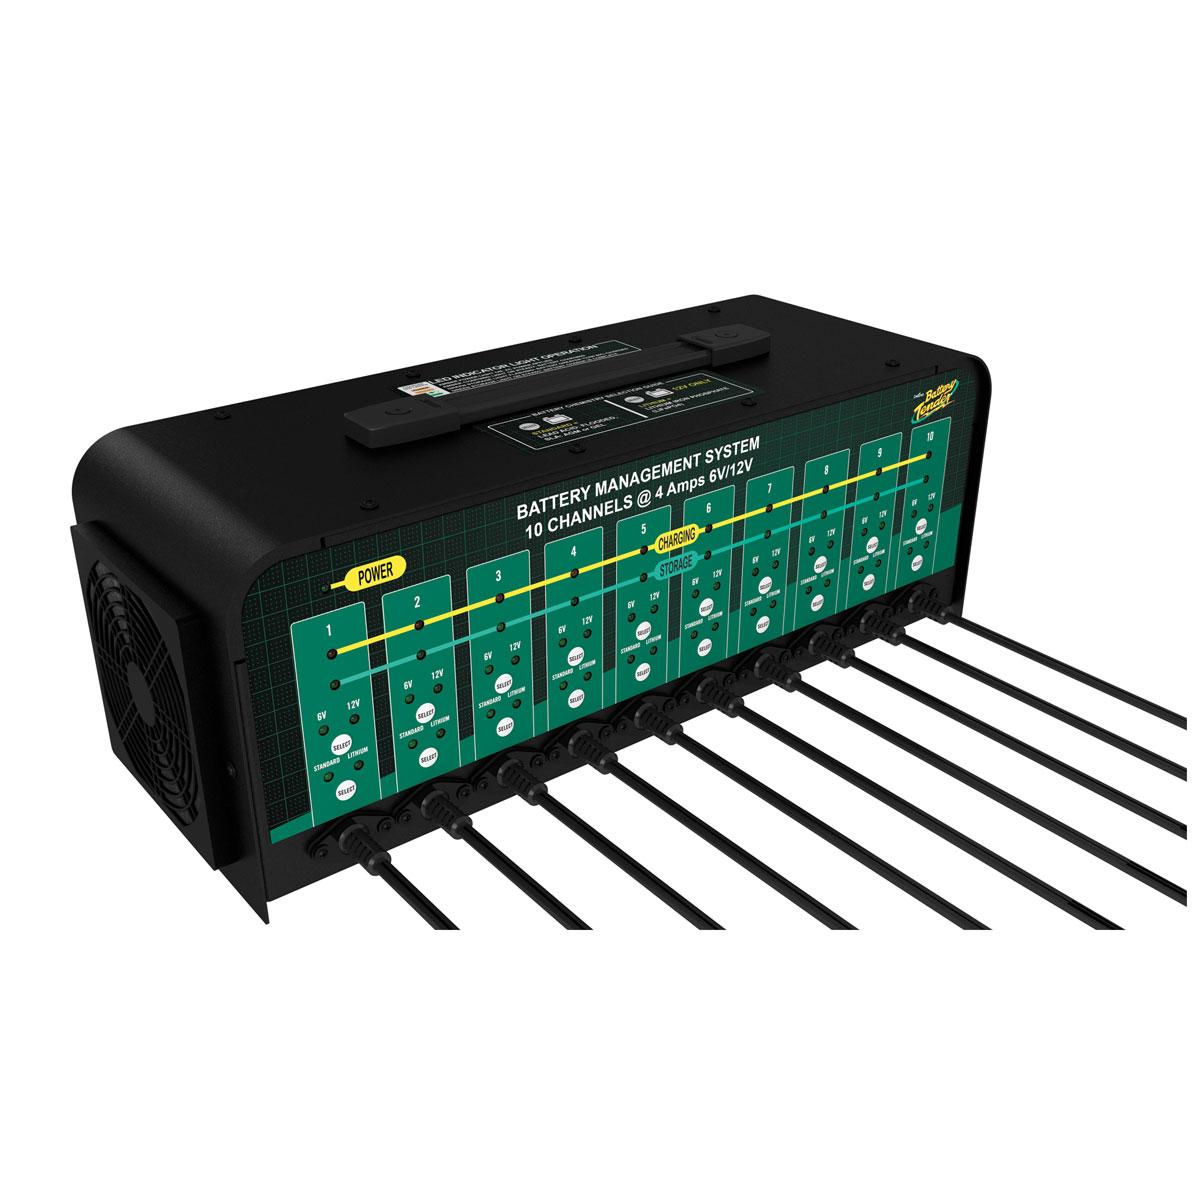 Battery Tender Super Smart 10 Port Battery Management System